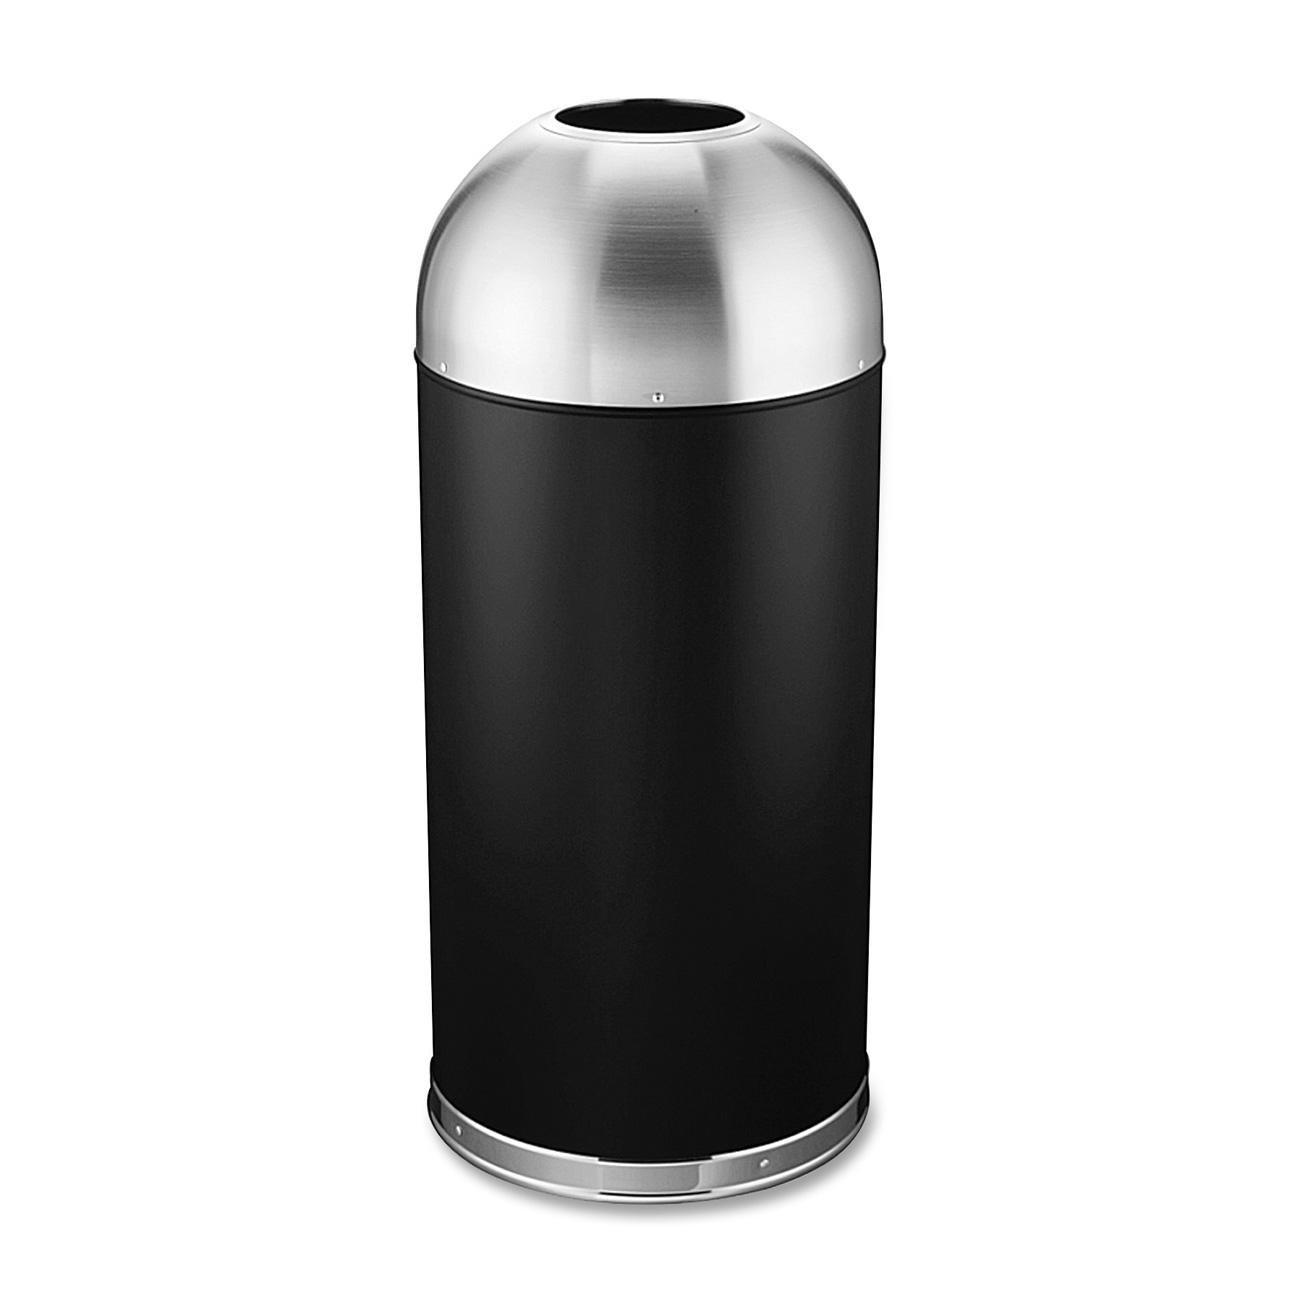 Genuine Joe GJO58896 Stainless Steel Domed Top Trash Receptacle, 15 gallon Capacity, Black/Silver